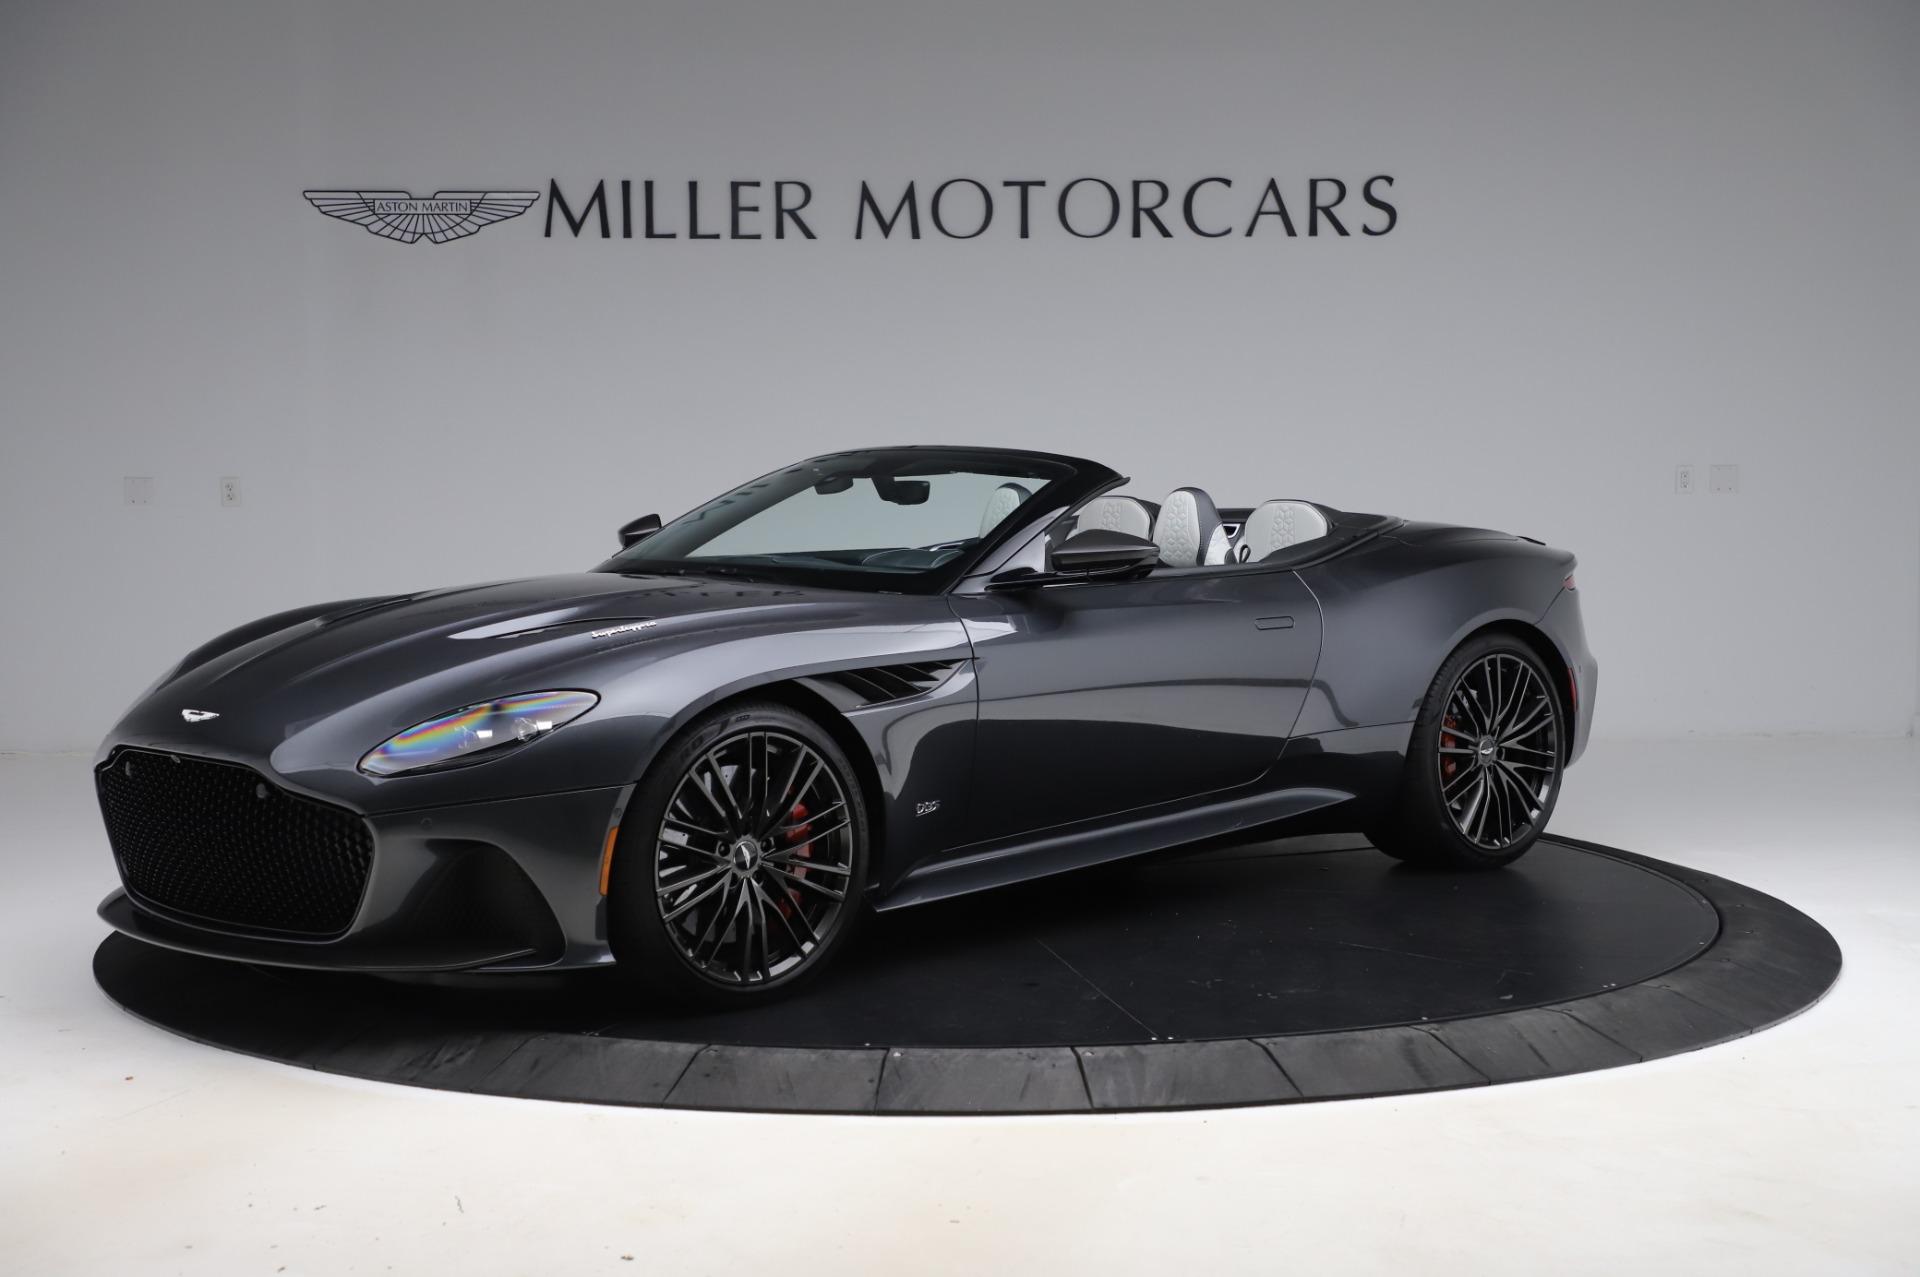 Used 2020 Aston Martin DBS Superleggera Volante for sale Sold at Alfa Romeo of Greenwich in Greenwich CT 06830 1